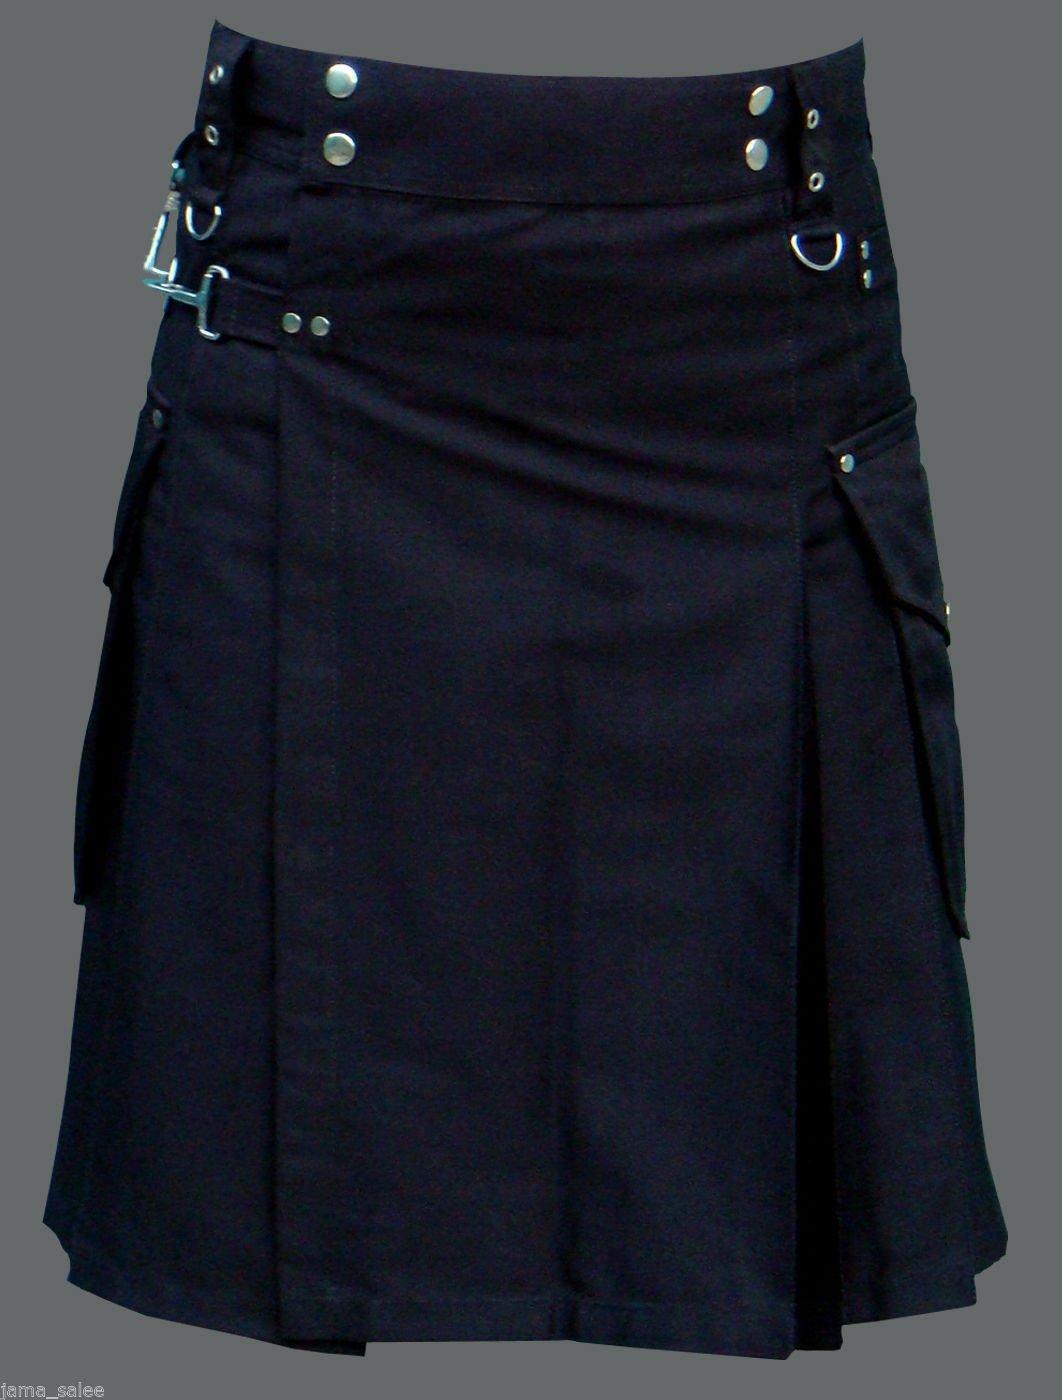 Deluxe Black Cotton Kilt Handmade Utility Gothic Modern Kilt with Cargo Pockets Waist Size 38 to Fit